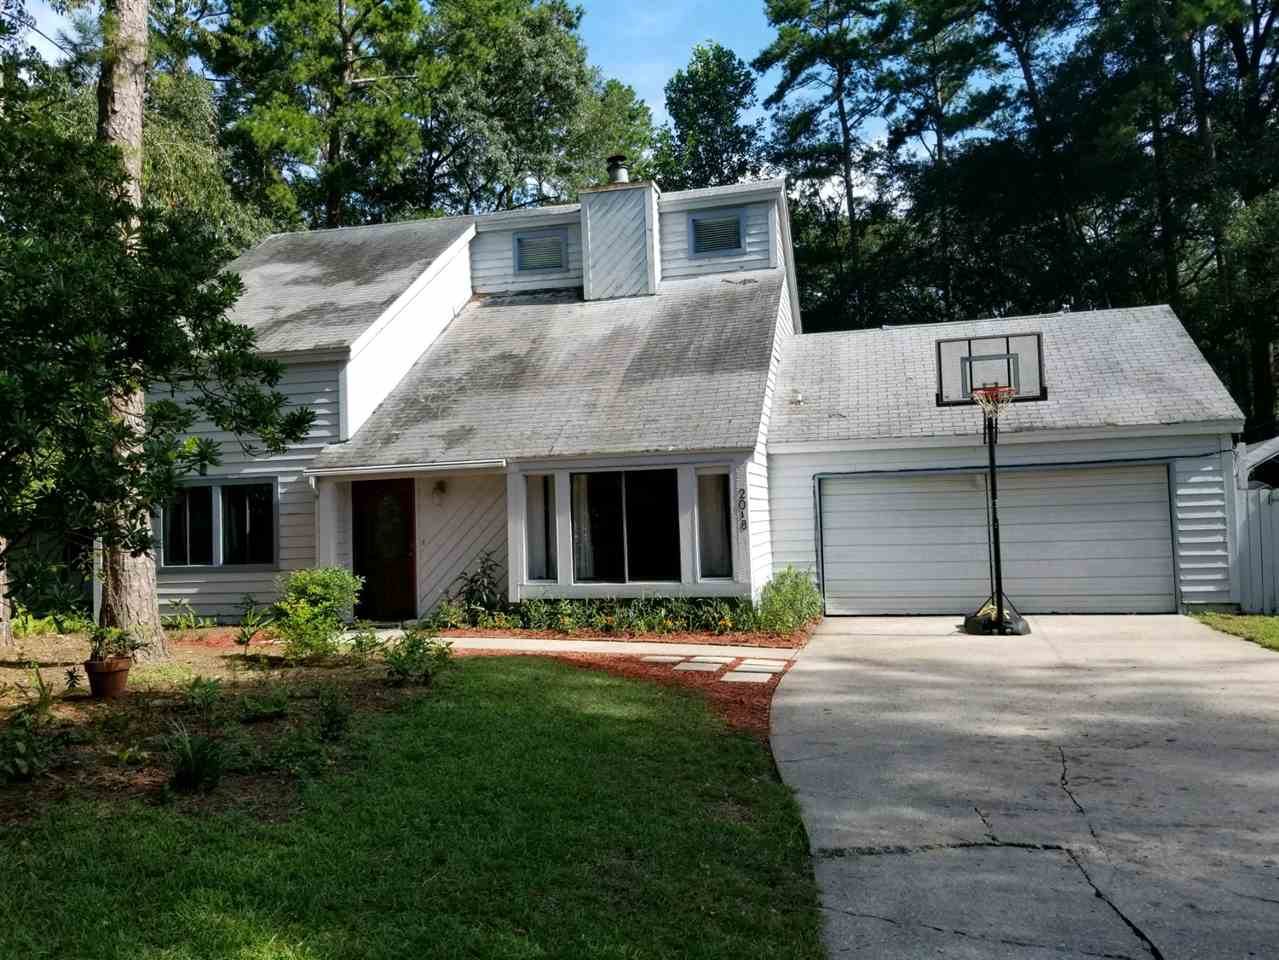 Property ID 284761